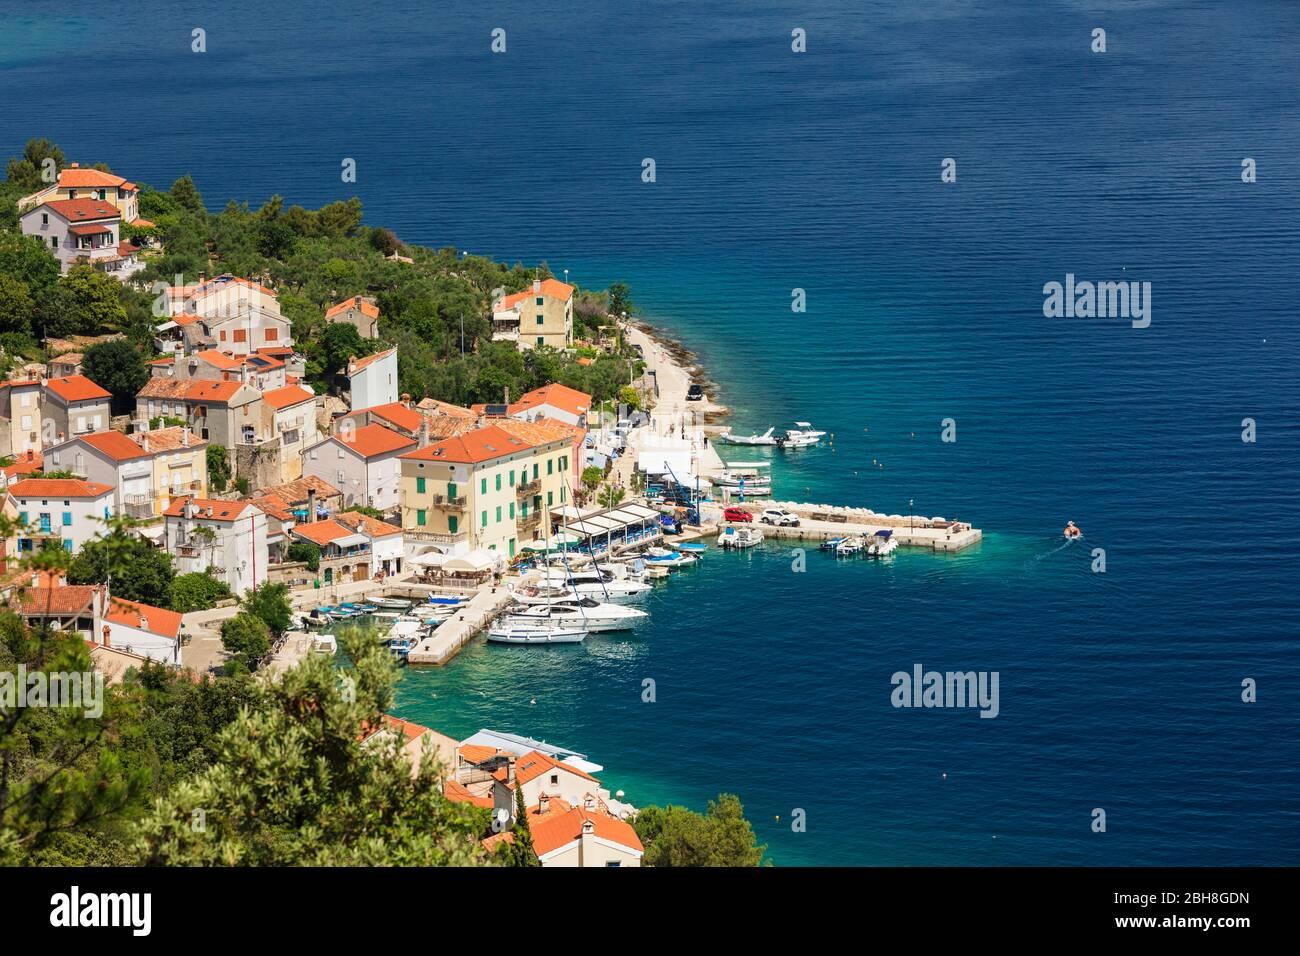 Valun, Cres Island, Kvarner bay, Croatia Stock Photo